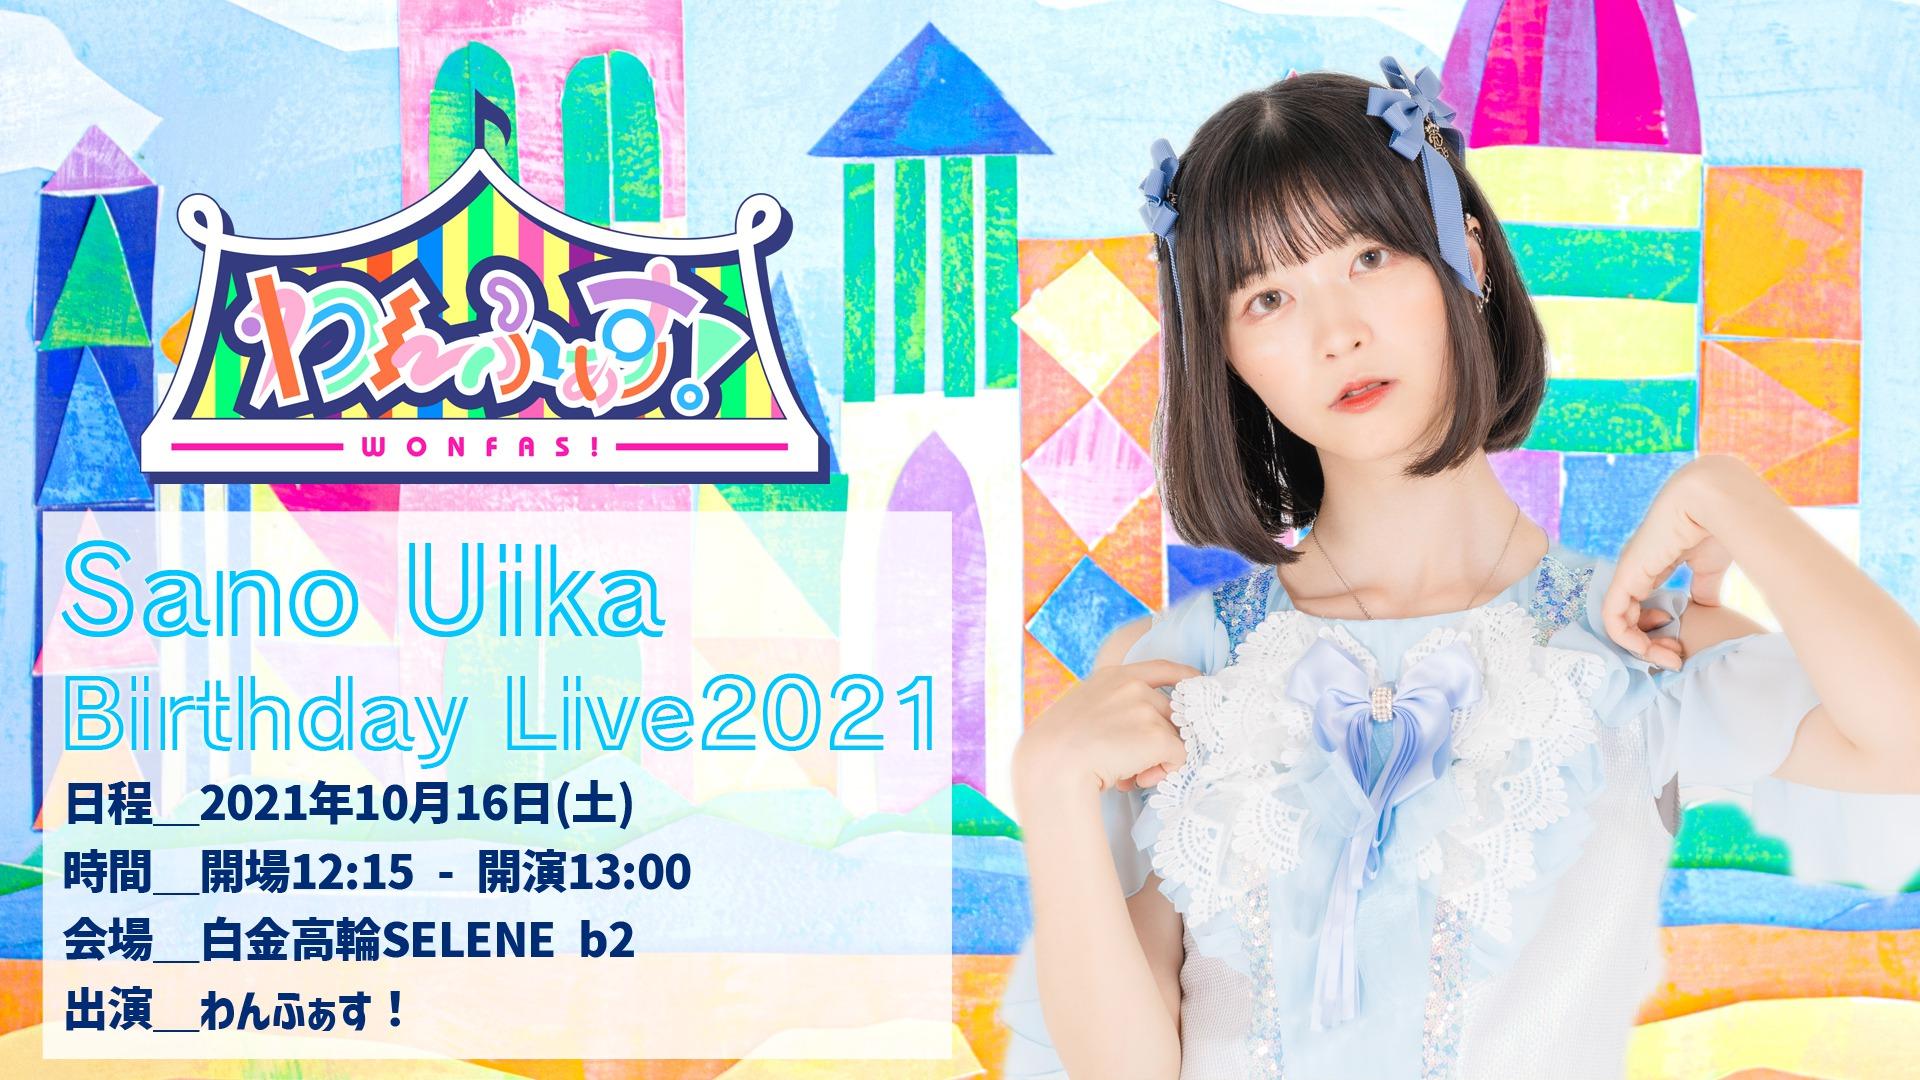 Sano Uika Birthday Live 2021